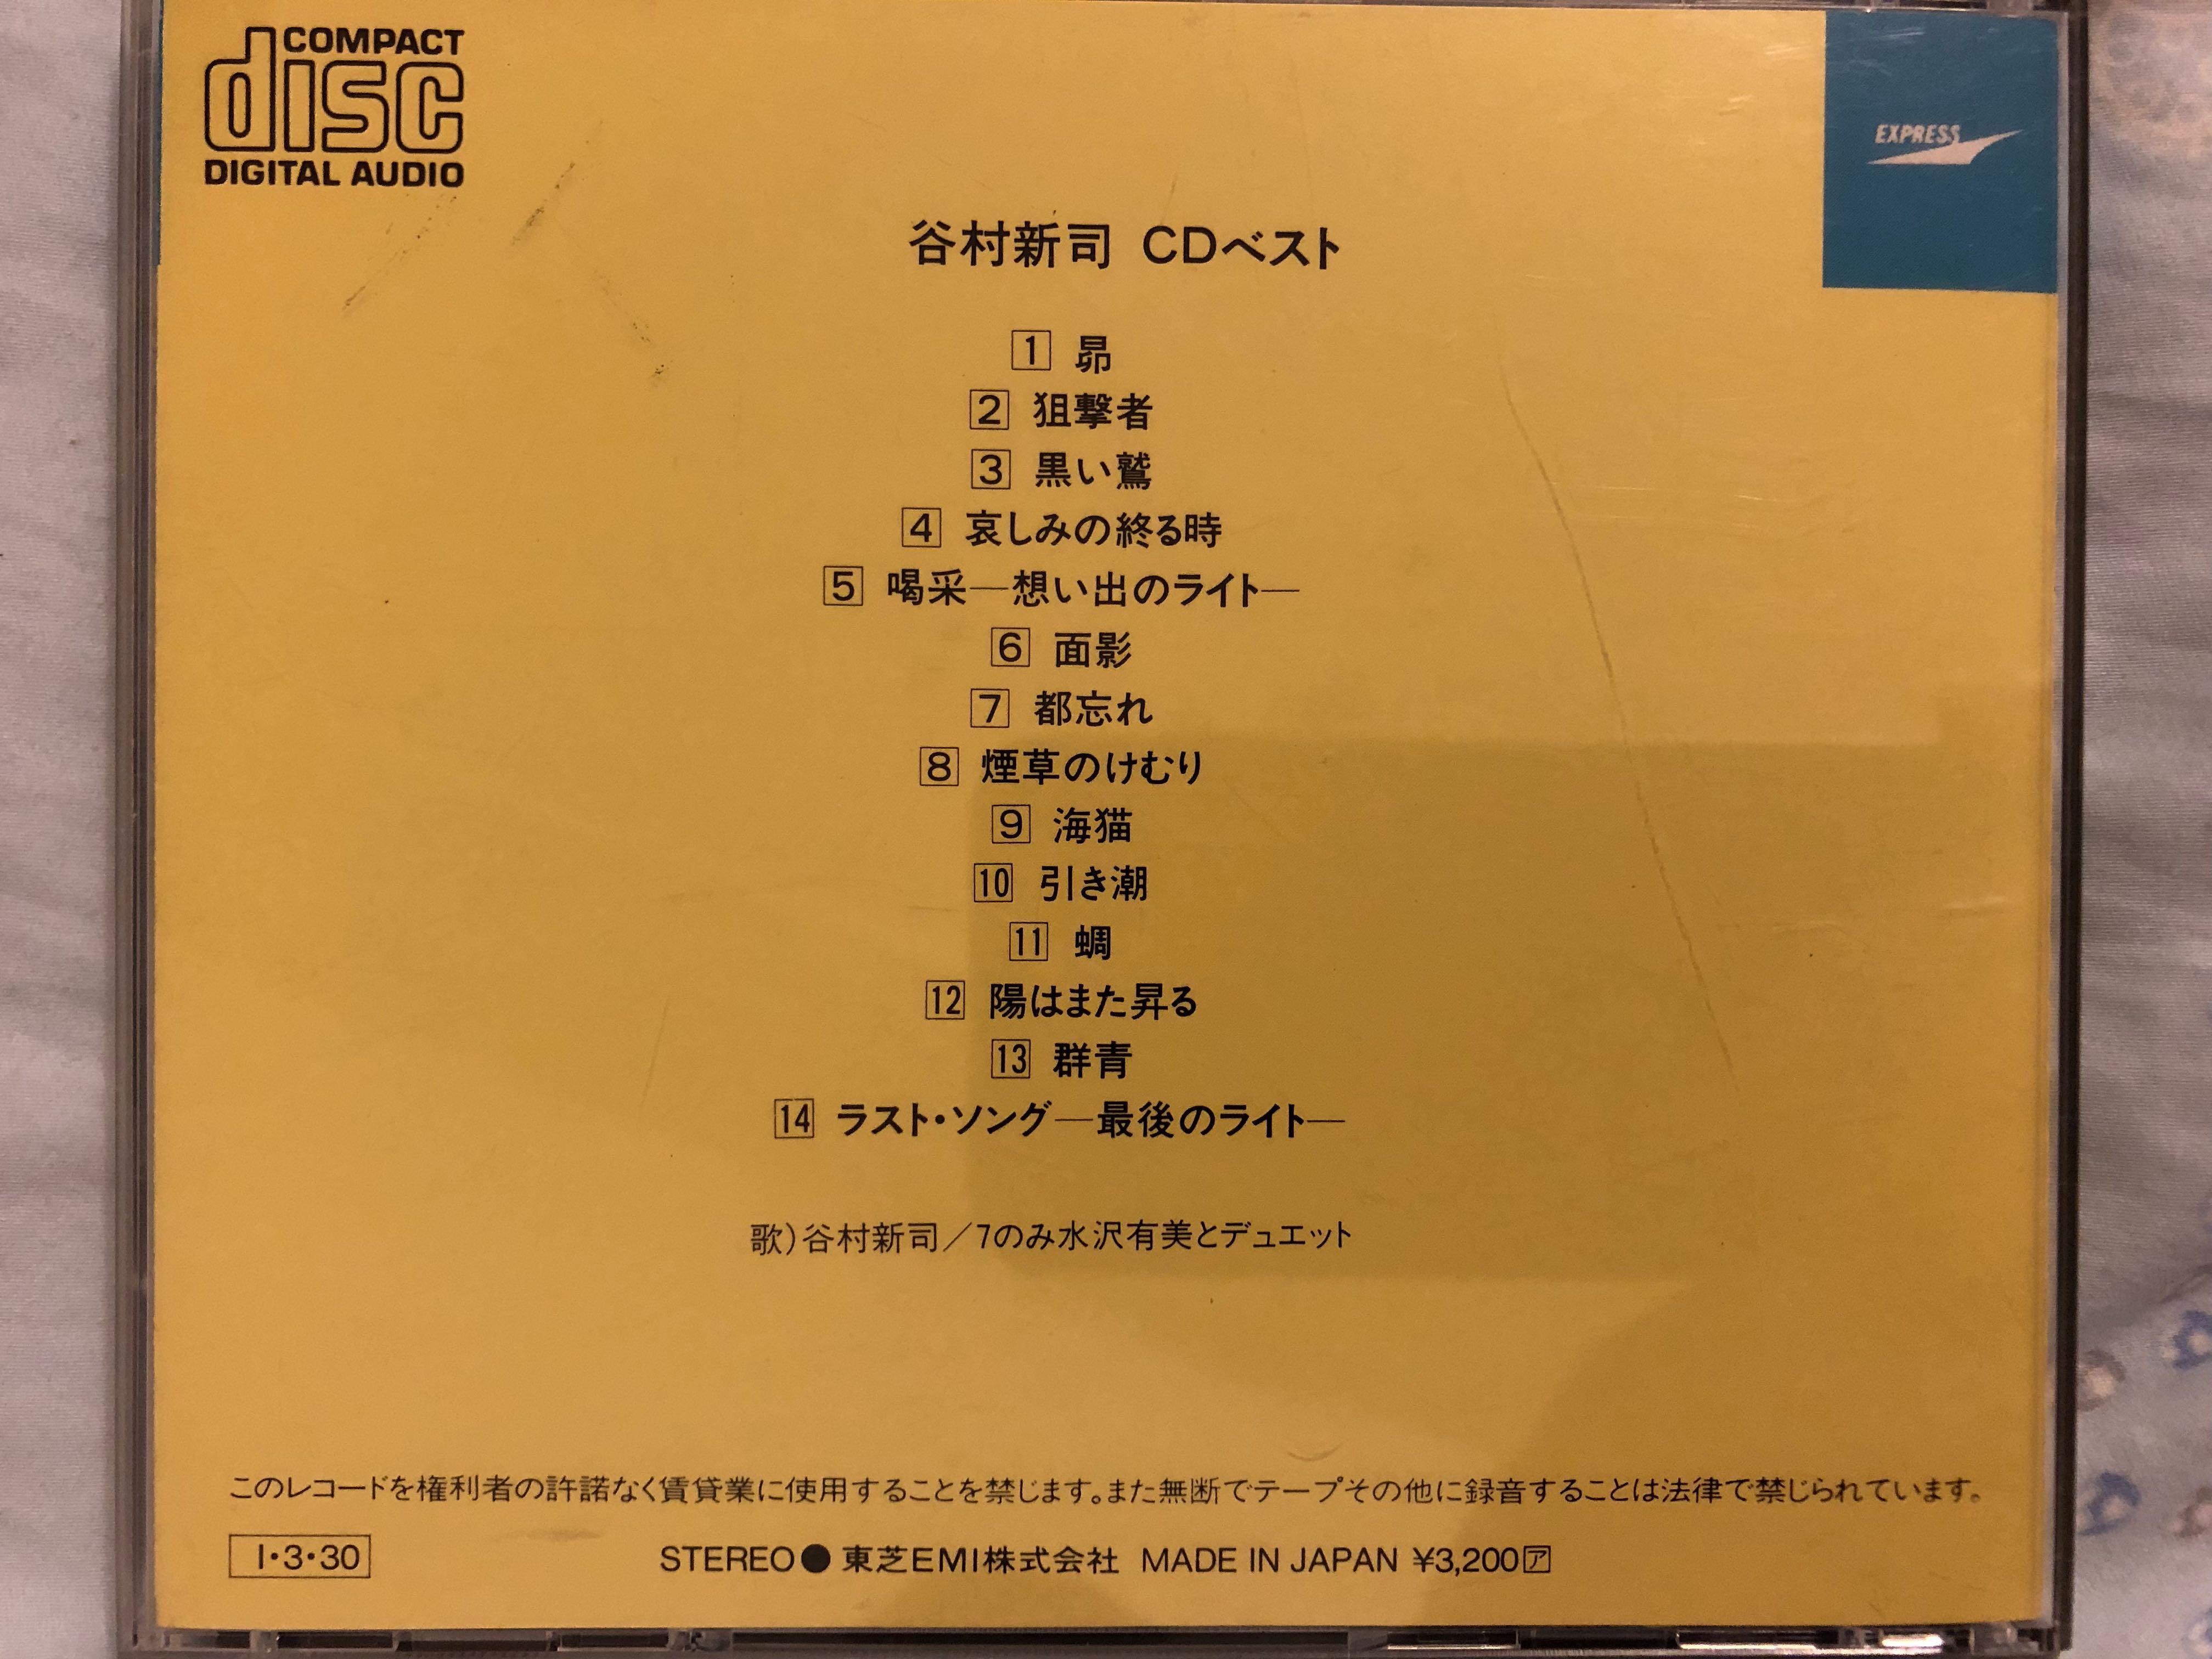 CD丨谷村新司 CD ベスト Best 日本版